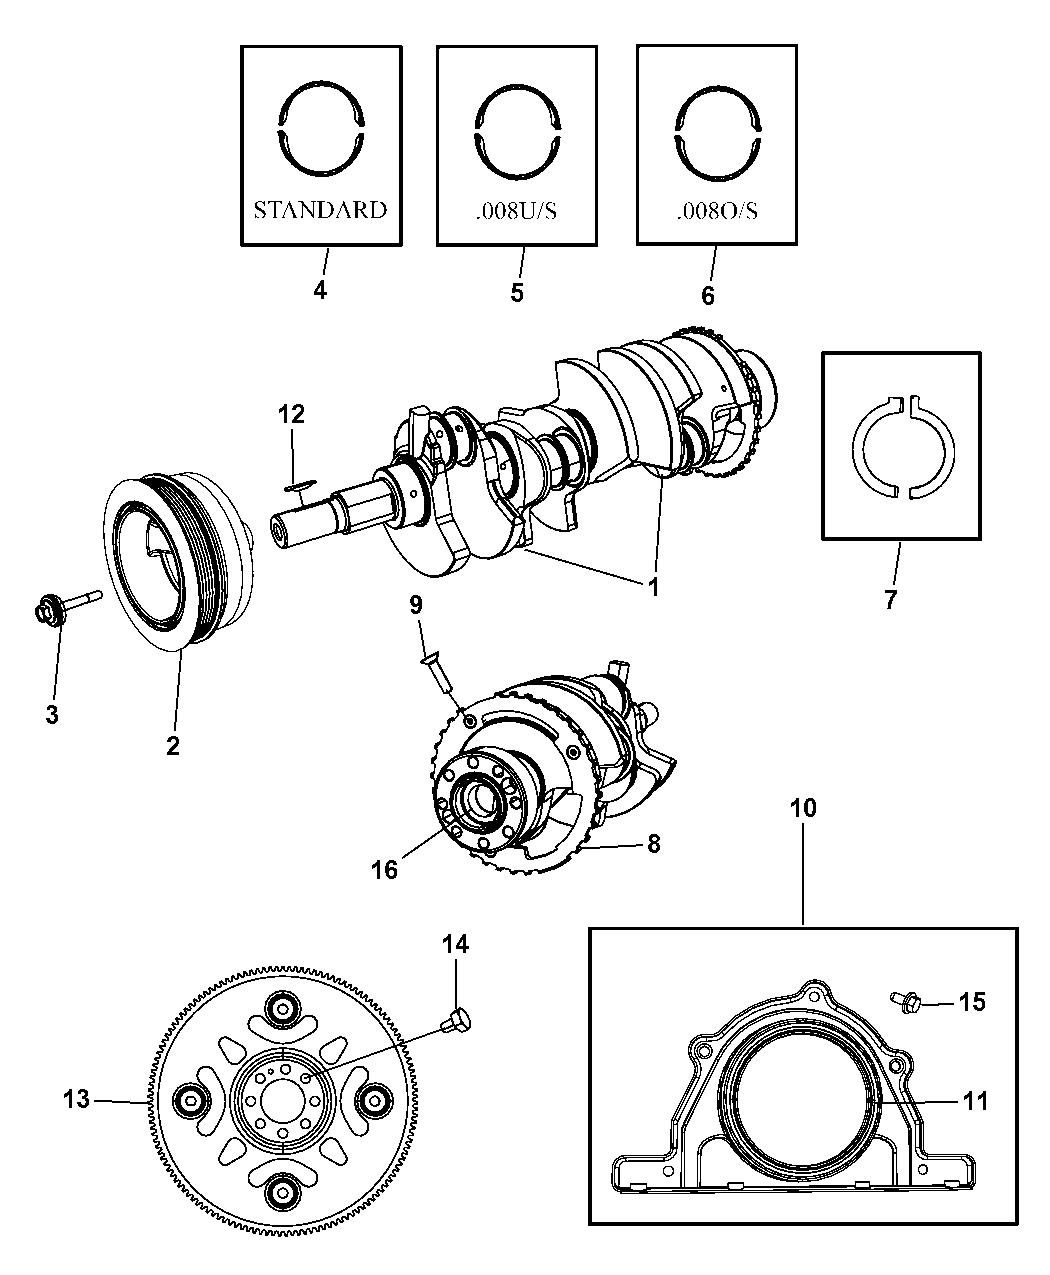 2008 Jeep Grand Cherokee Crankshaft Bearings Damper Engine Diagram Flywheel Drive Plate And